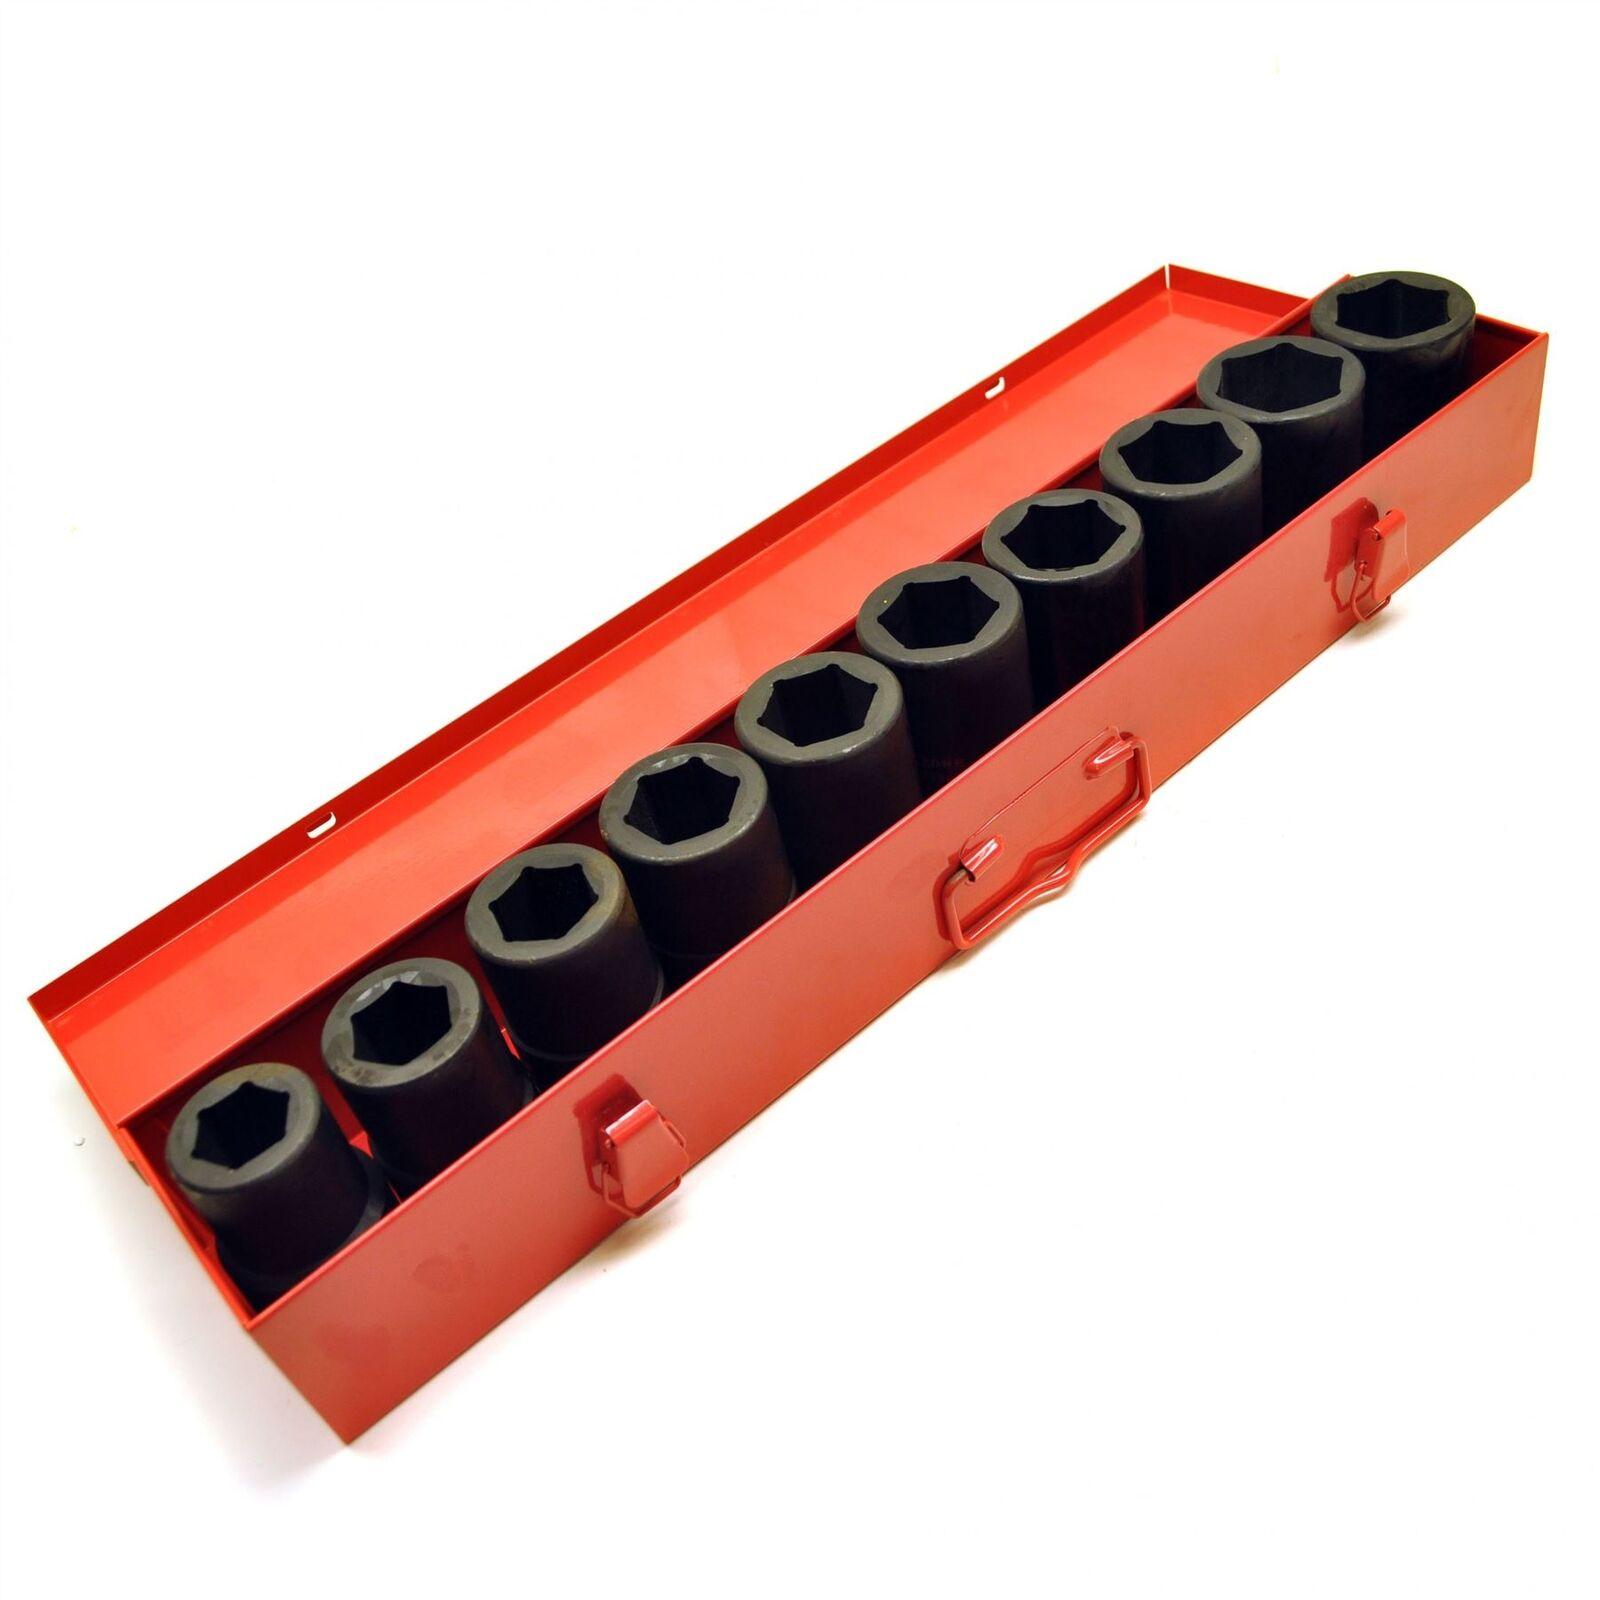 10pc Deep Hex Impact Socket Set Metric 1  dr Sockets 22mm to 50mm 6 Sided TE317